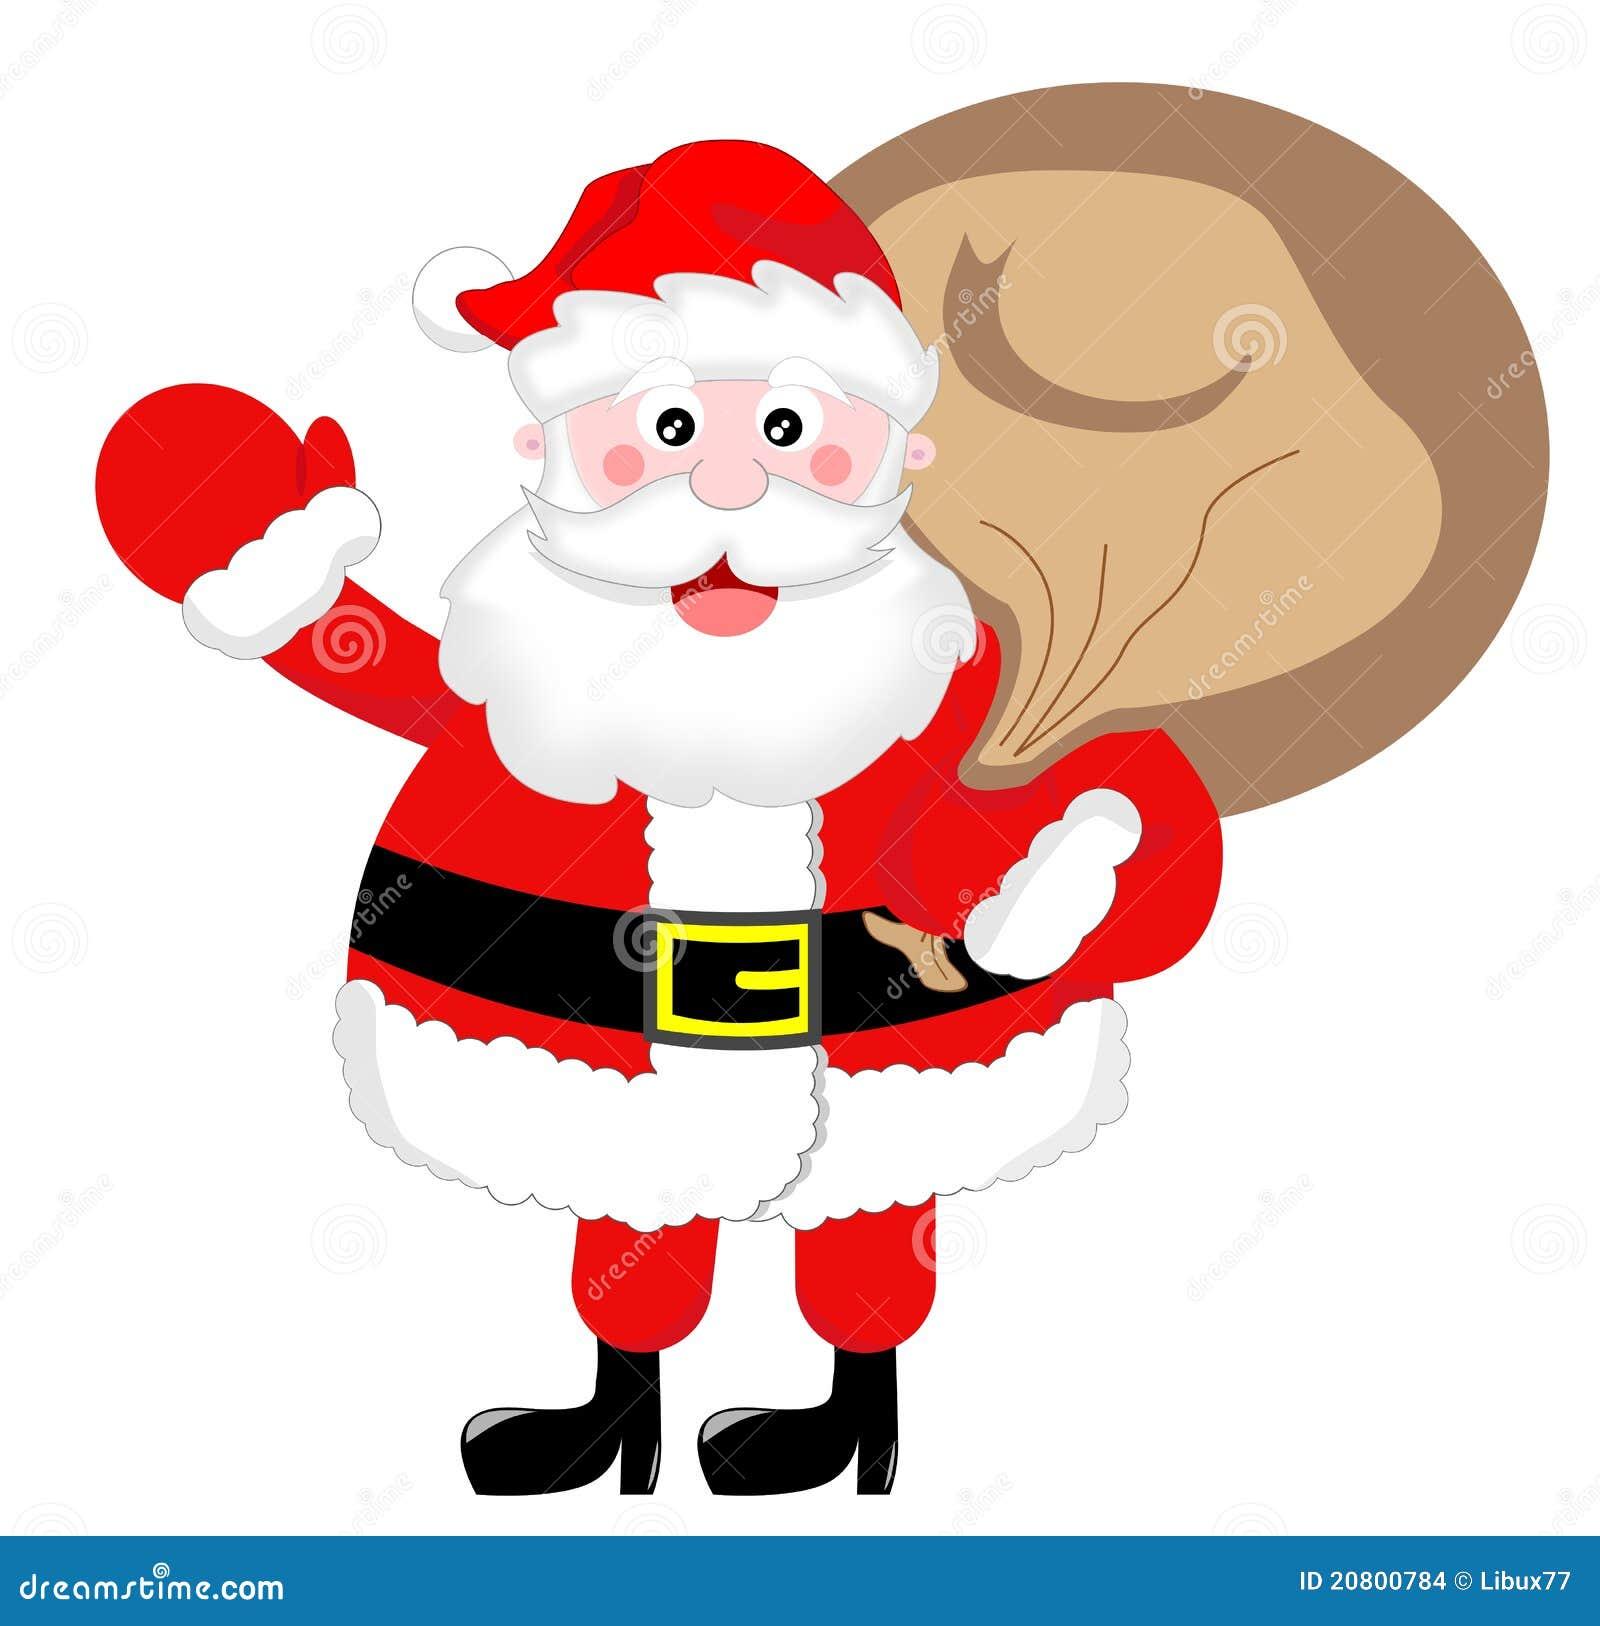 Santa claus greeting with sack stock illustration illustration of santa claus greeting with sack m4hsunfo